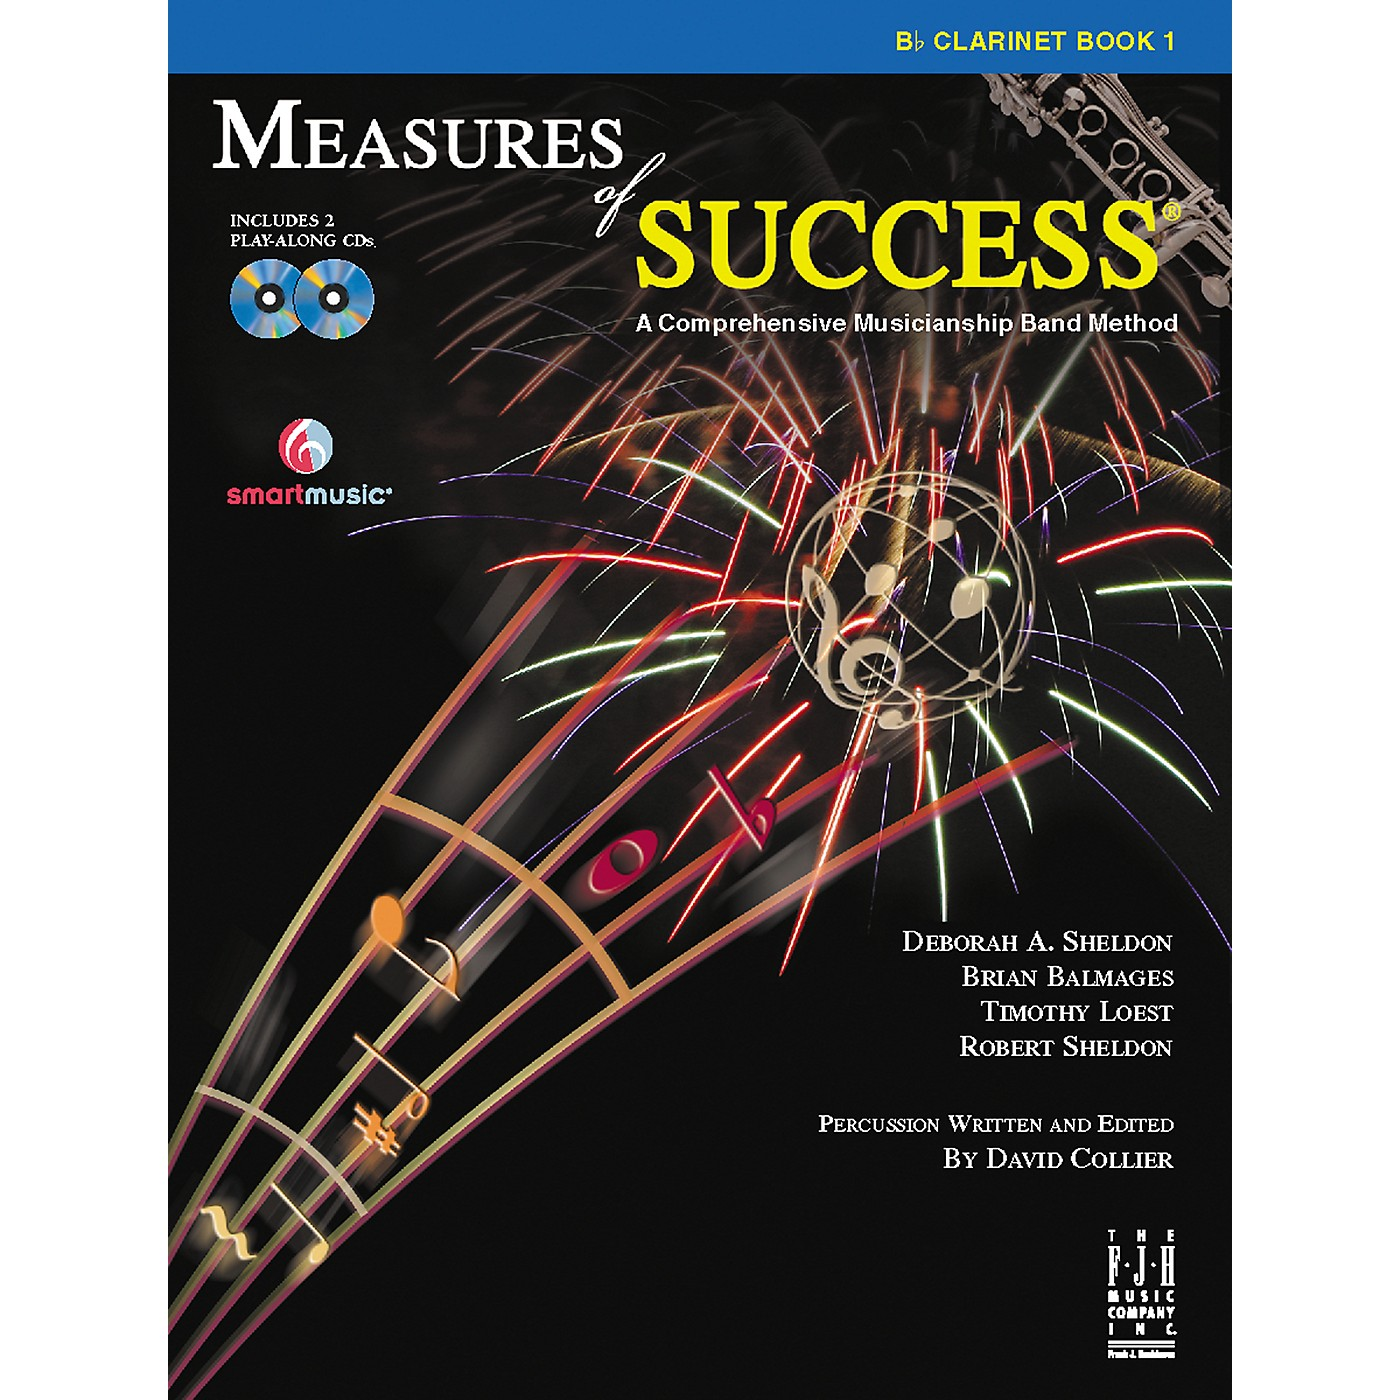 FJH Music Measures of Success Clarinet Book 1 thumbnail